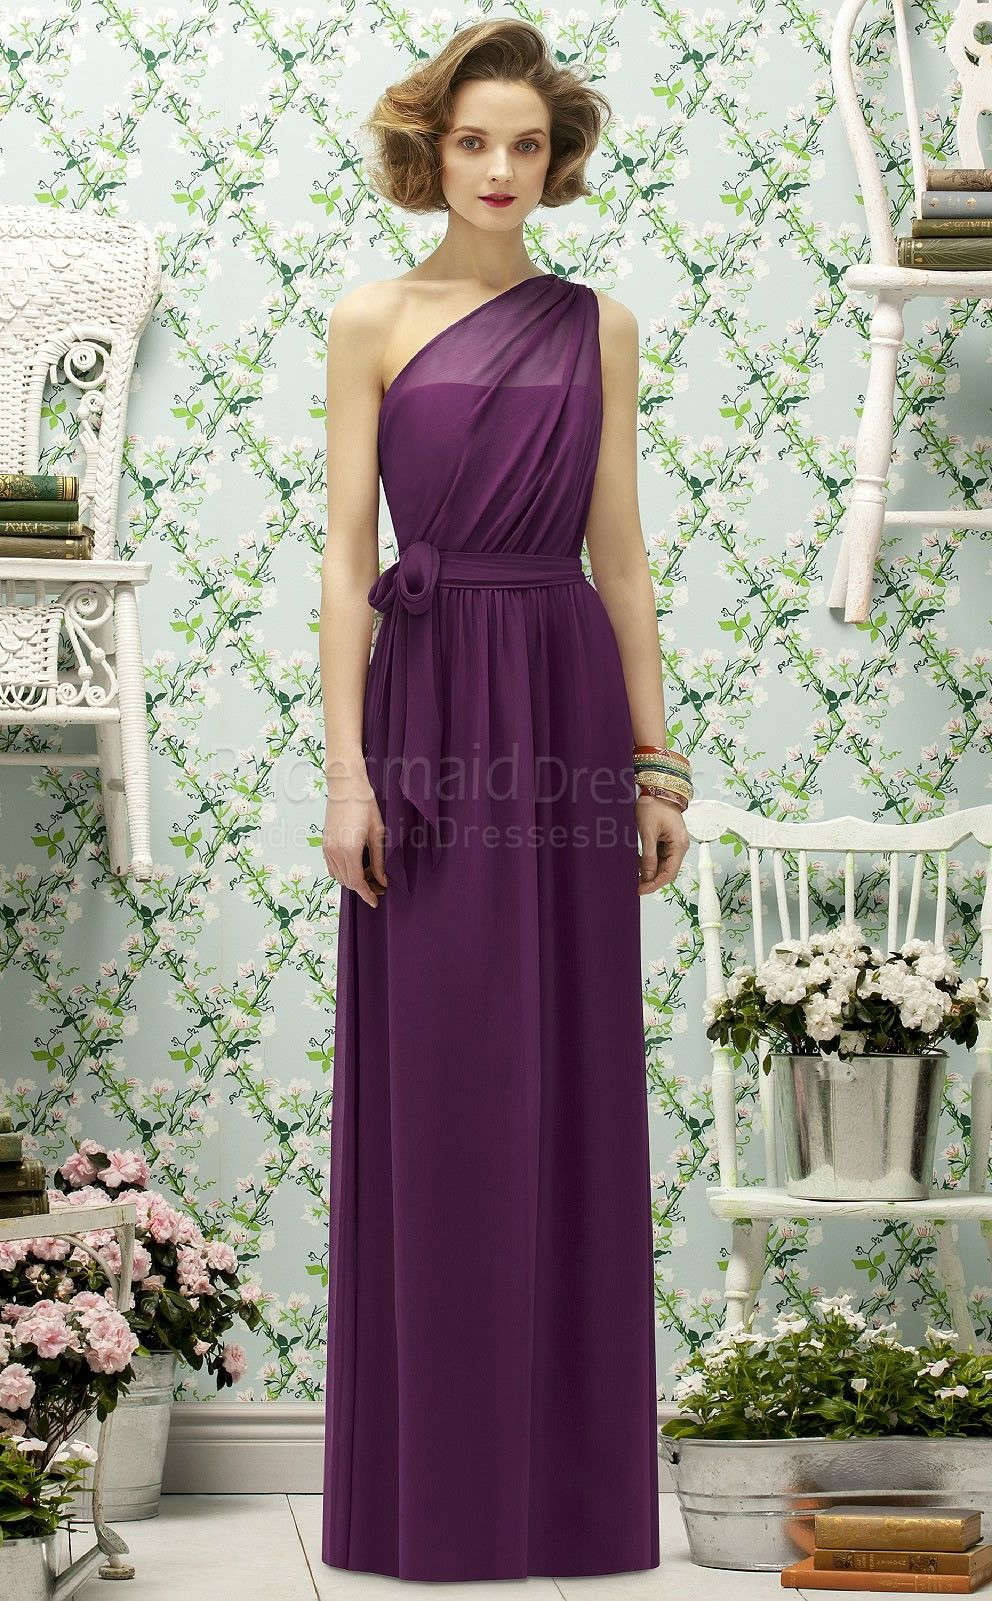 A-line-Sleeveless-One-Shoulder-Grape-Chiffon-Floor-length ...